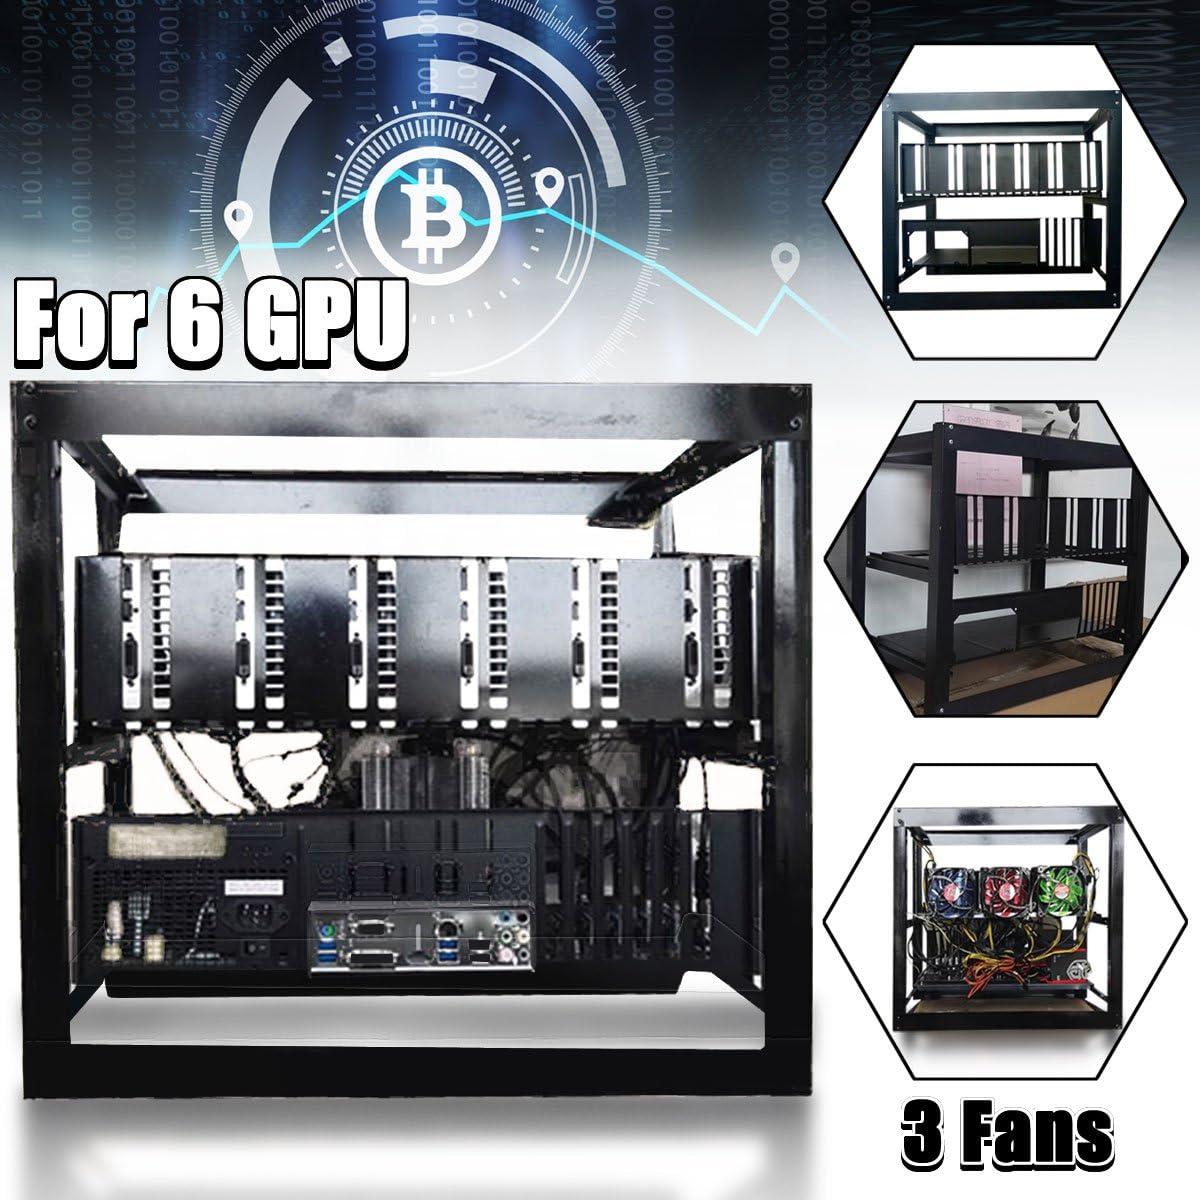 DIY Miner Mining Case Open Air Frame Mining Miner Rig Case W// 3x Fans For 6 GPU ETH BTC Ethereum